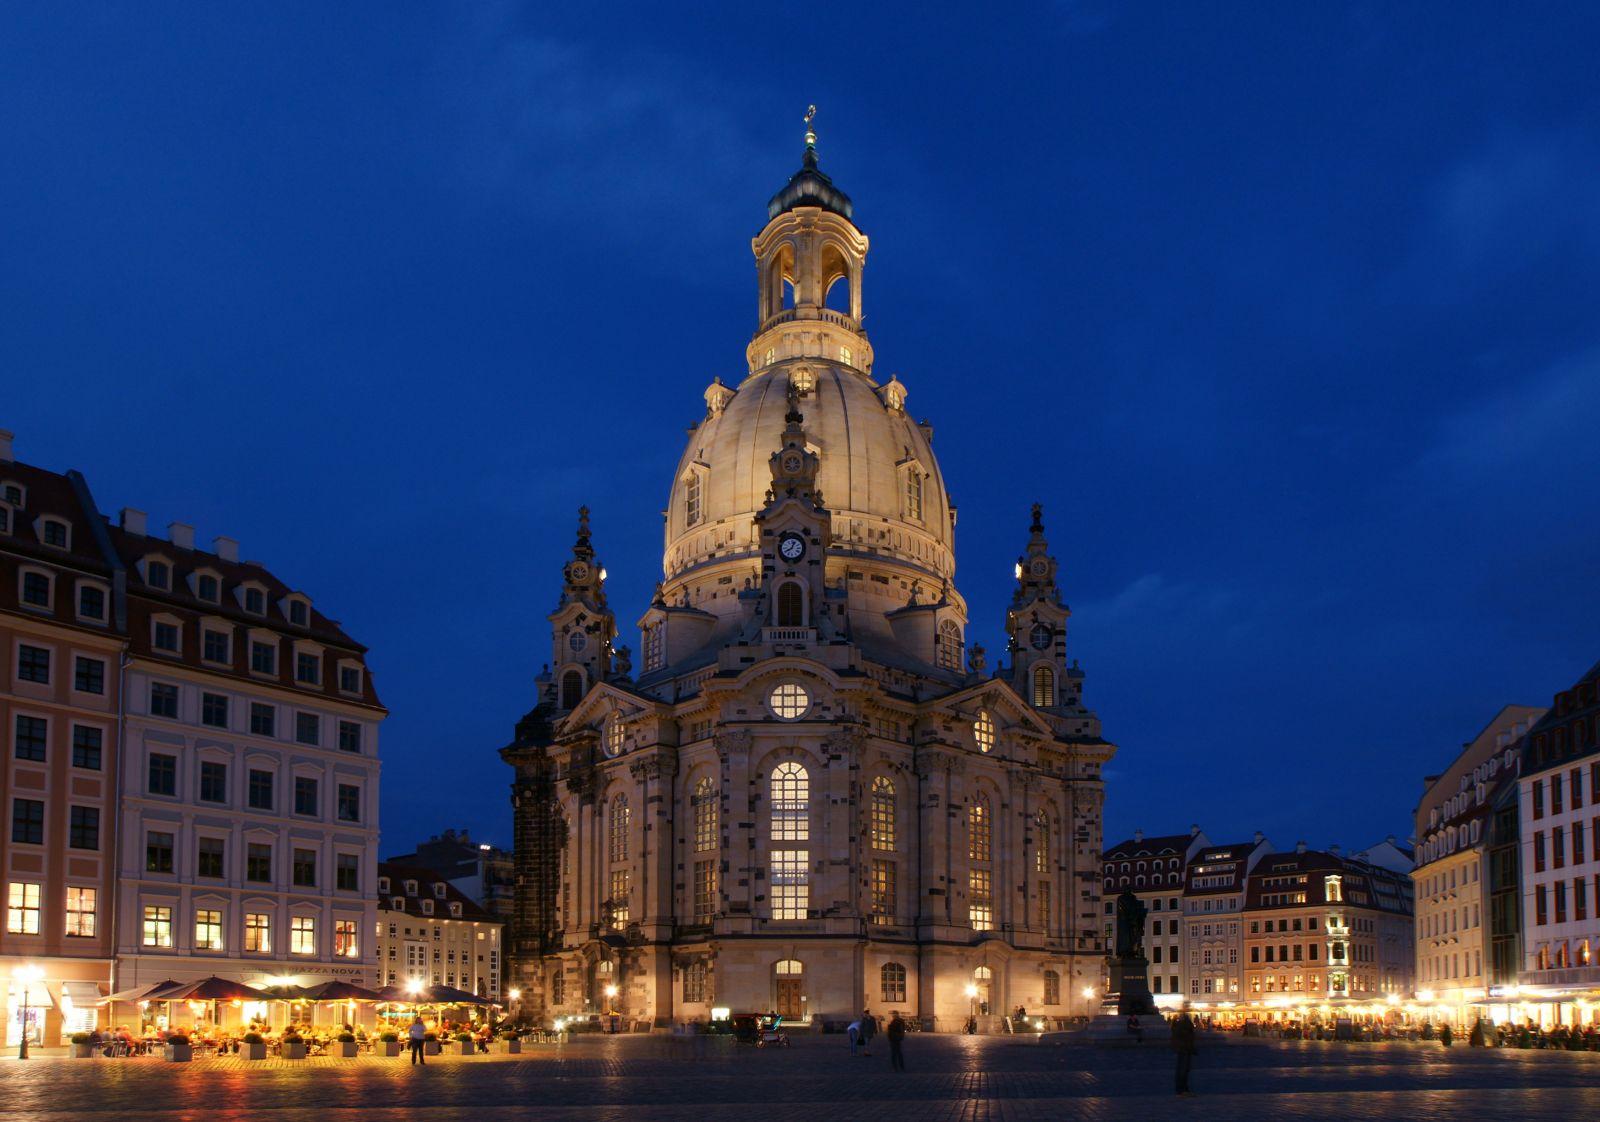 Frauenkirche_Blaue_Stunde